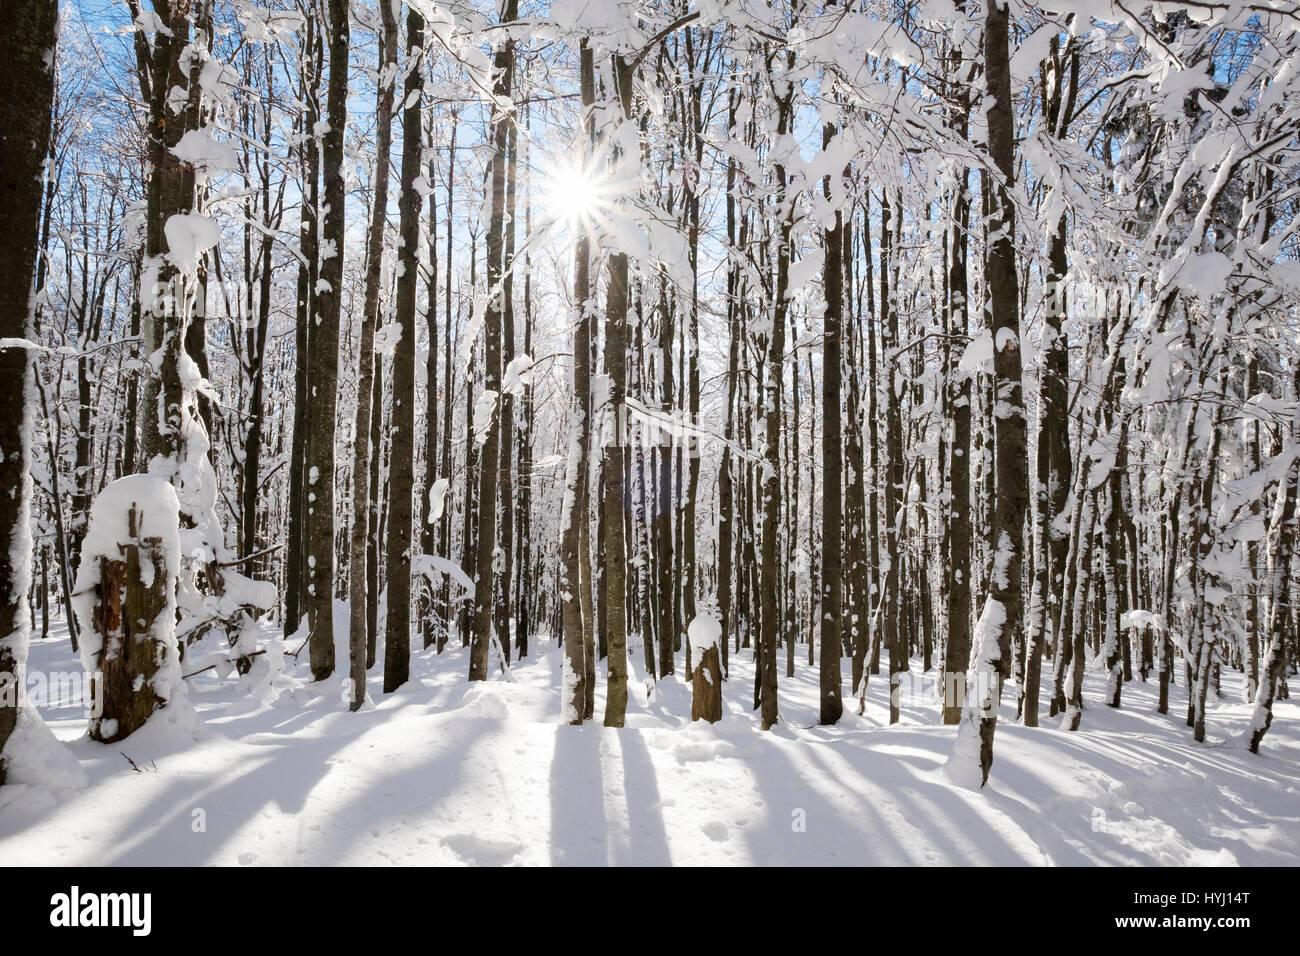 Beech trunks, forest with snow, Lusen in Neuschönau, Bavarian Forest National Park, Lower Bavaria, Bavaria, Germany Stock Photo